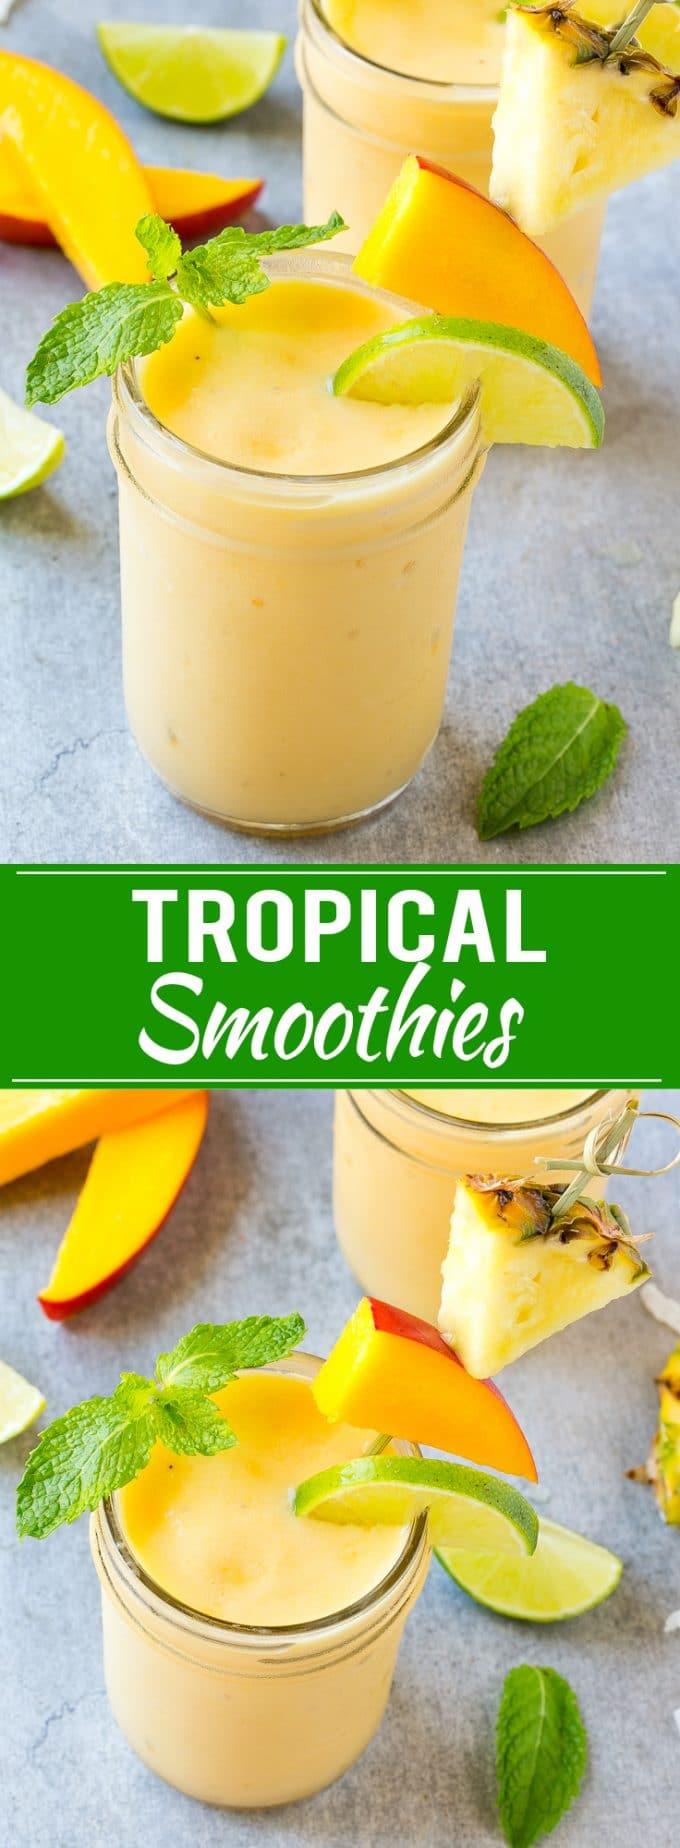 Tropical Smoothie Recipe | Healthy Smoothie Recipe | Easy Smoothie Recipe